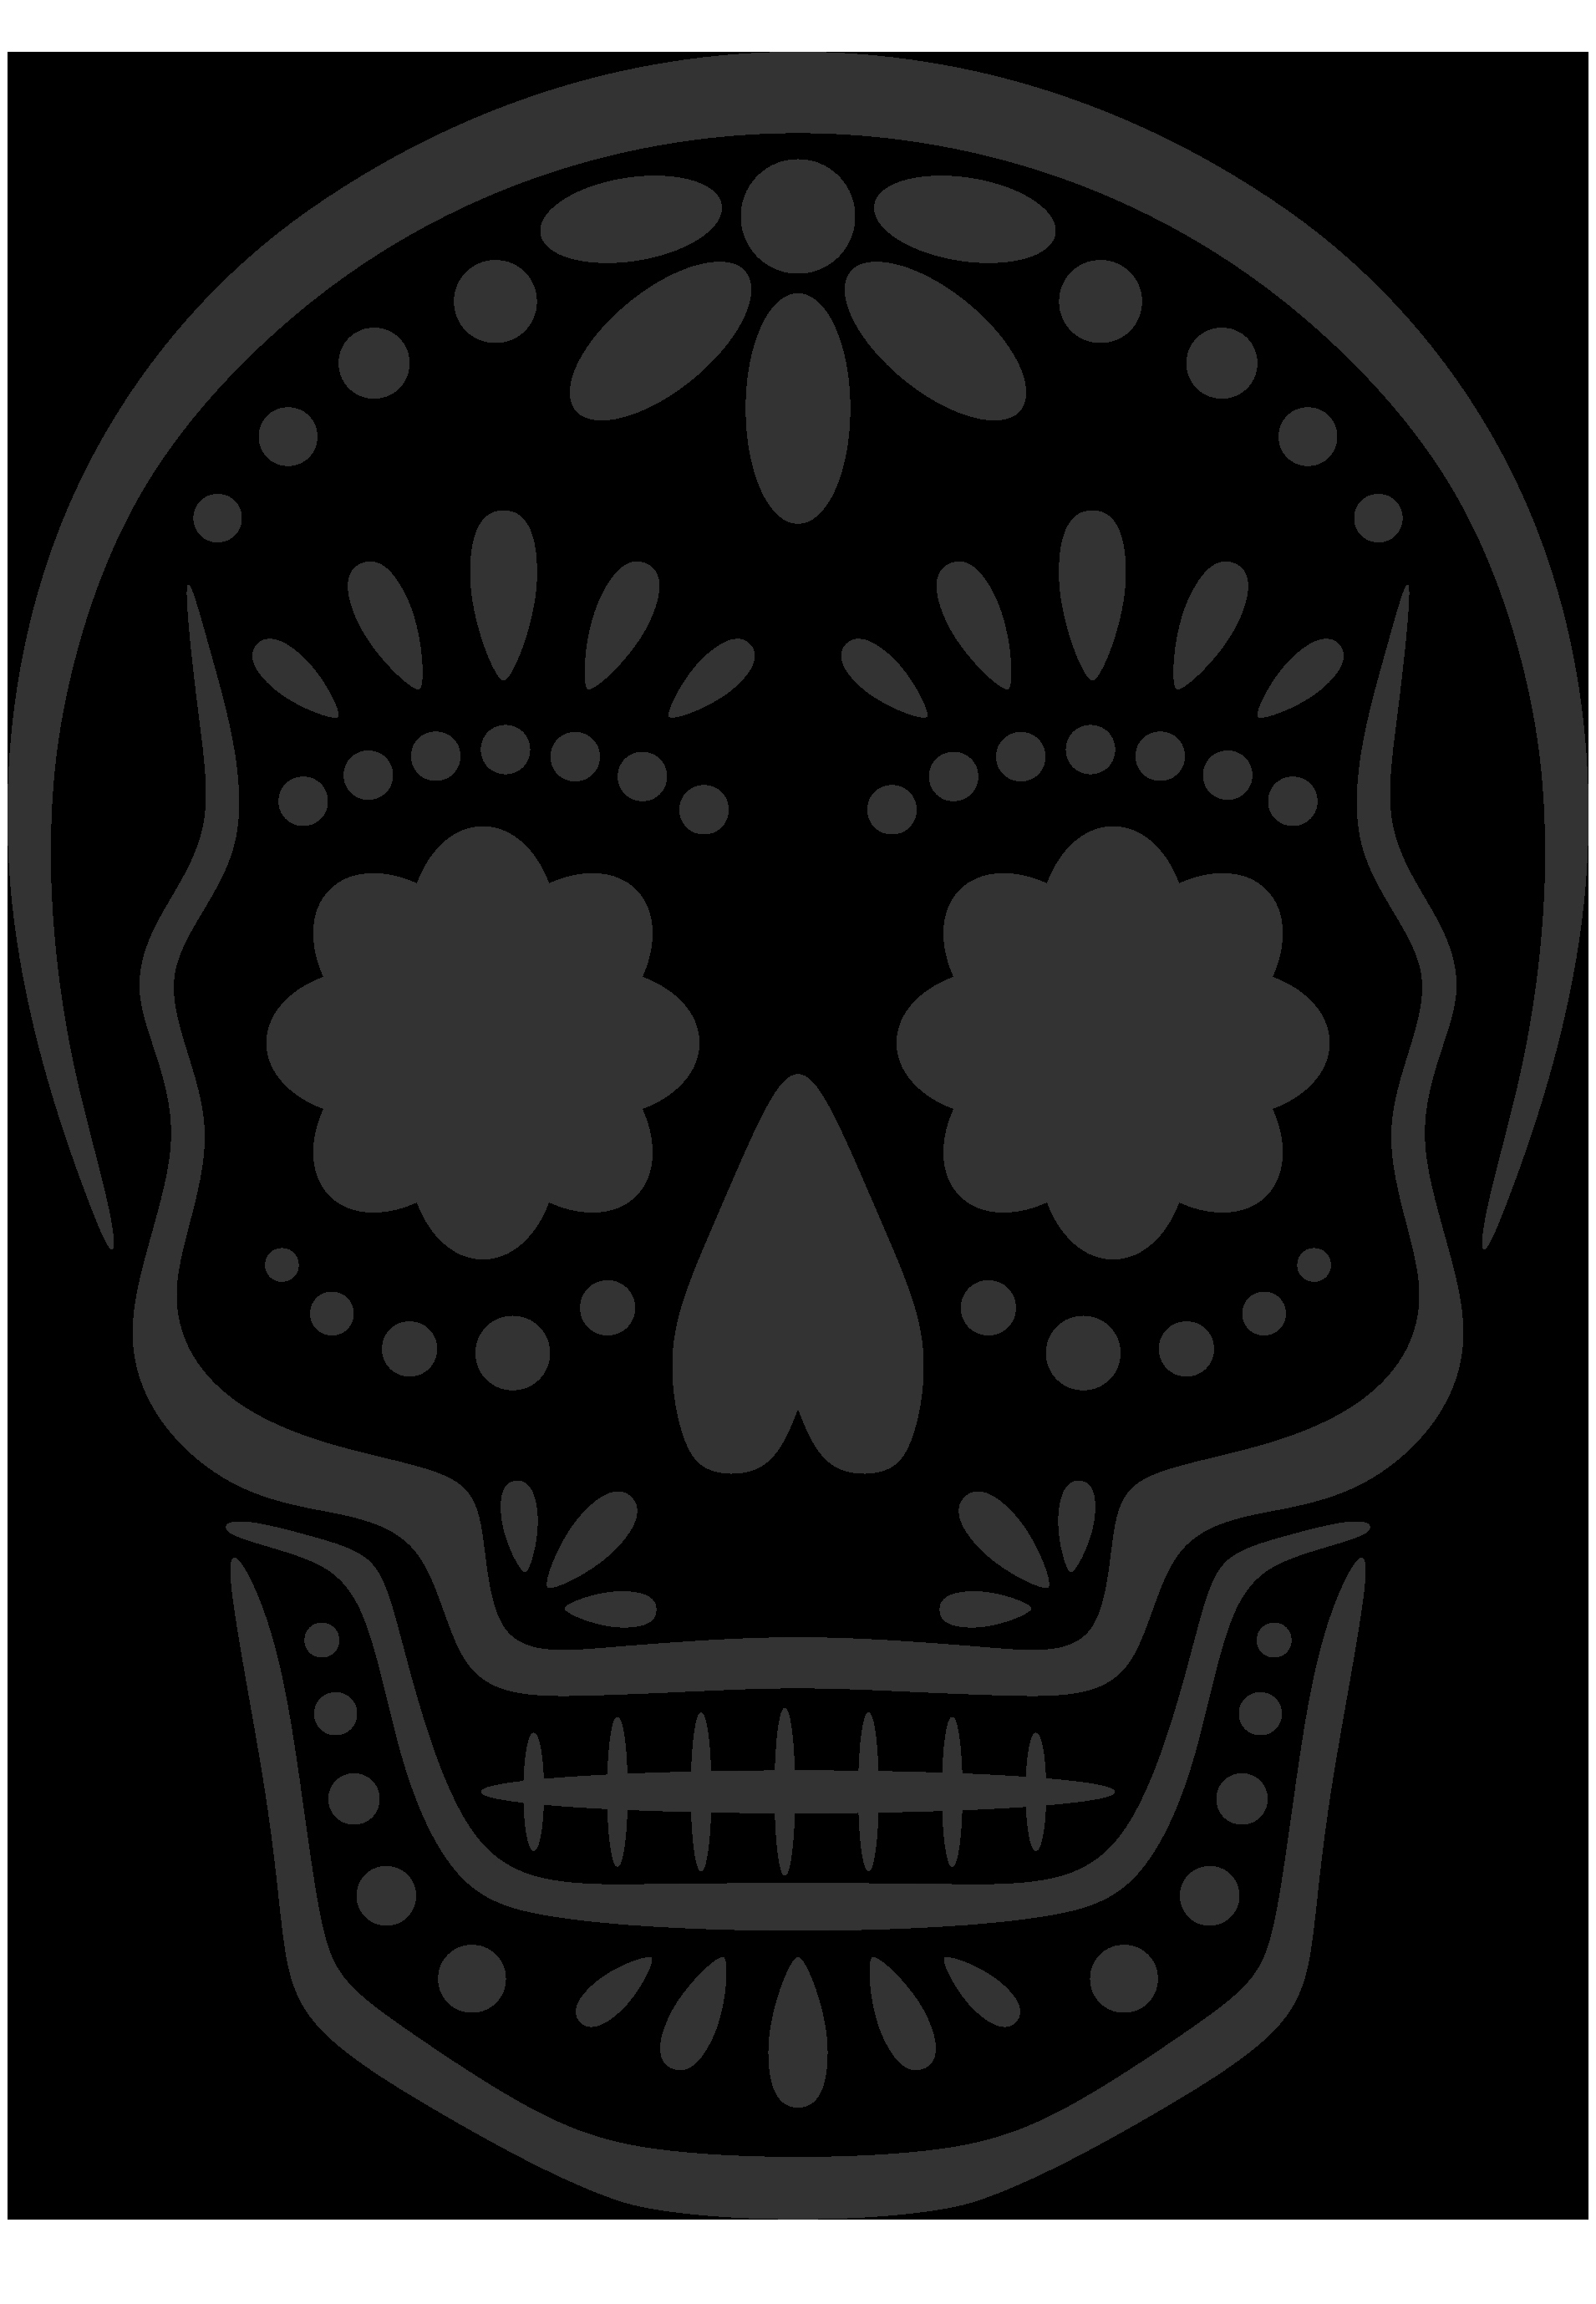 Sugar Skull Pumpkin Stencil Fresh events In Louisville Ky Republic Bank First Friday Hop